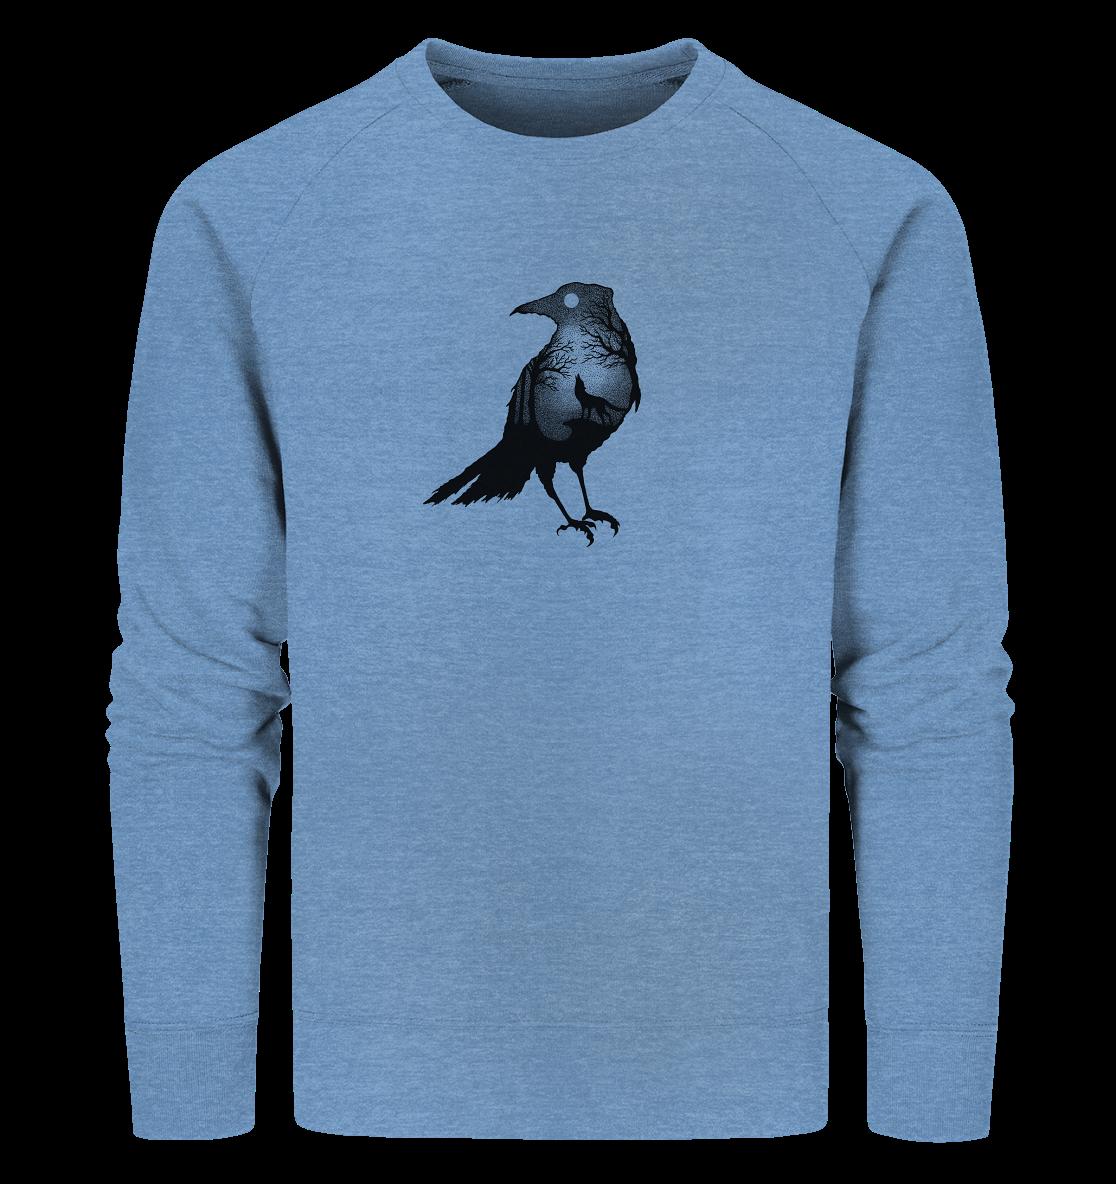 front-organic-sweatshirt-6090c4-1116x-2.png